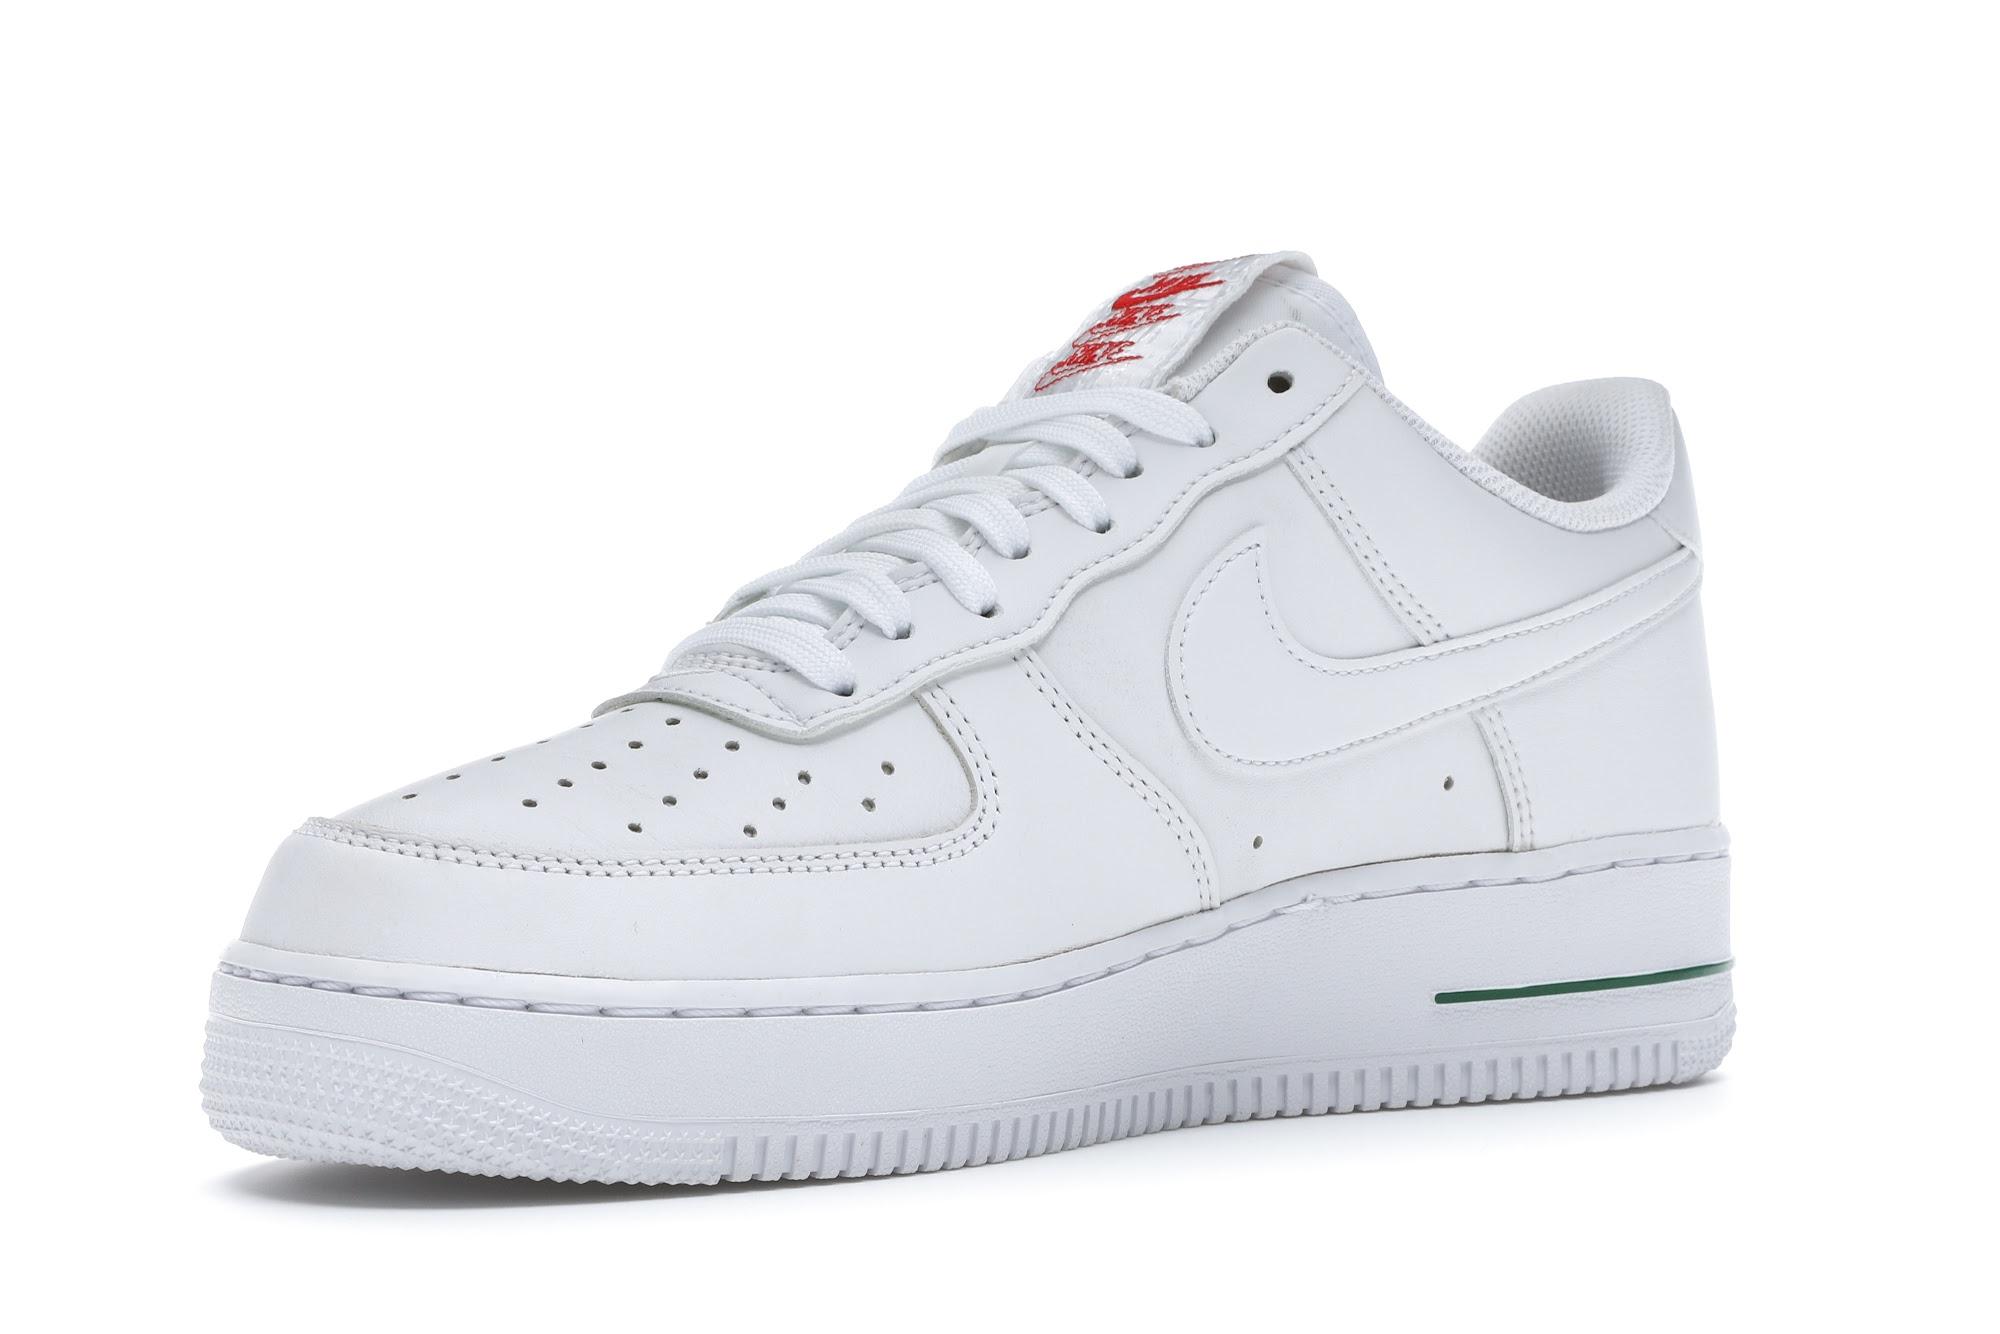 Nike Air Force 1 Low Rose White - CU6312-100